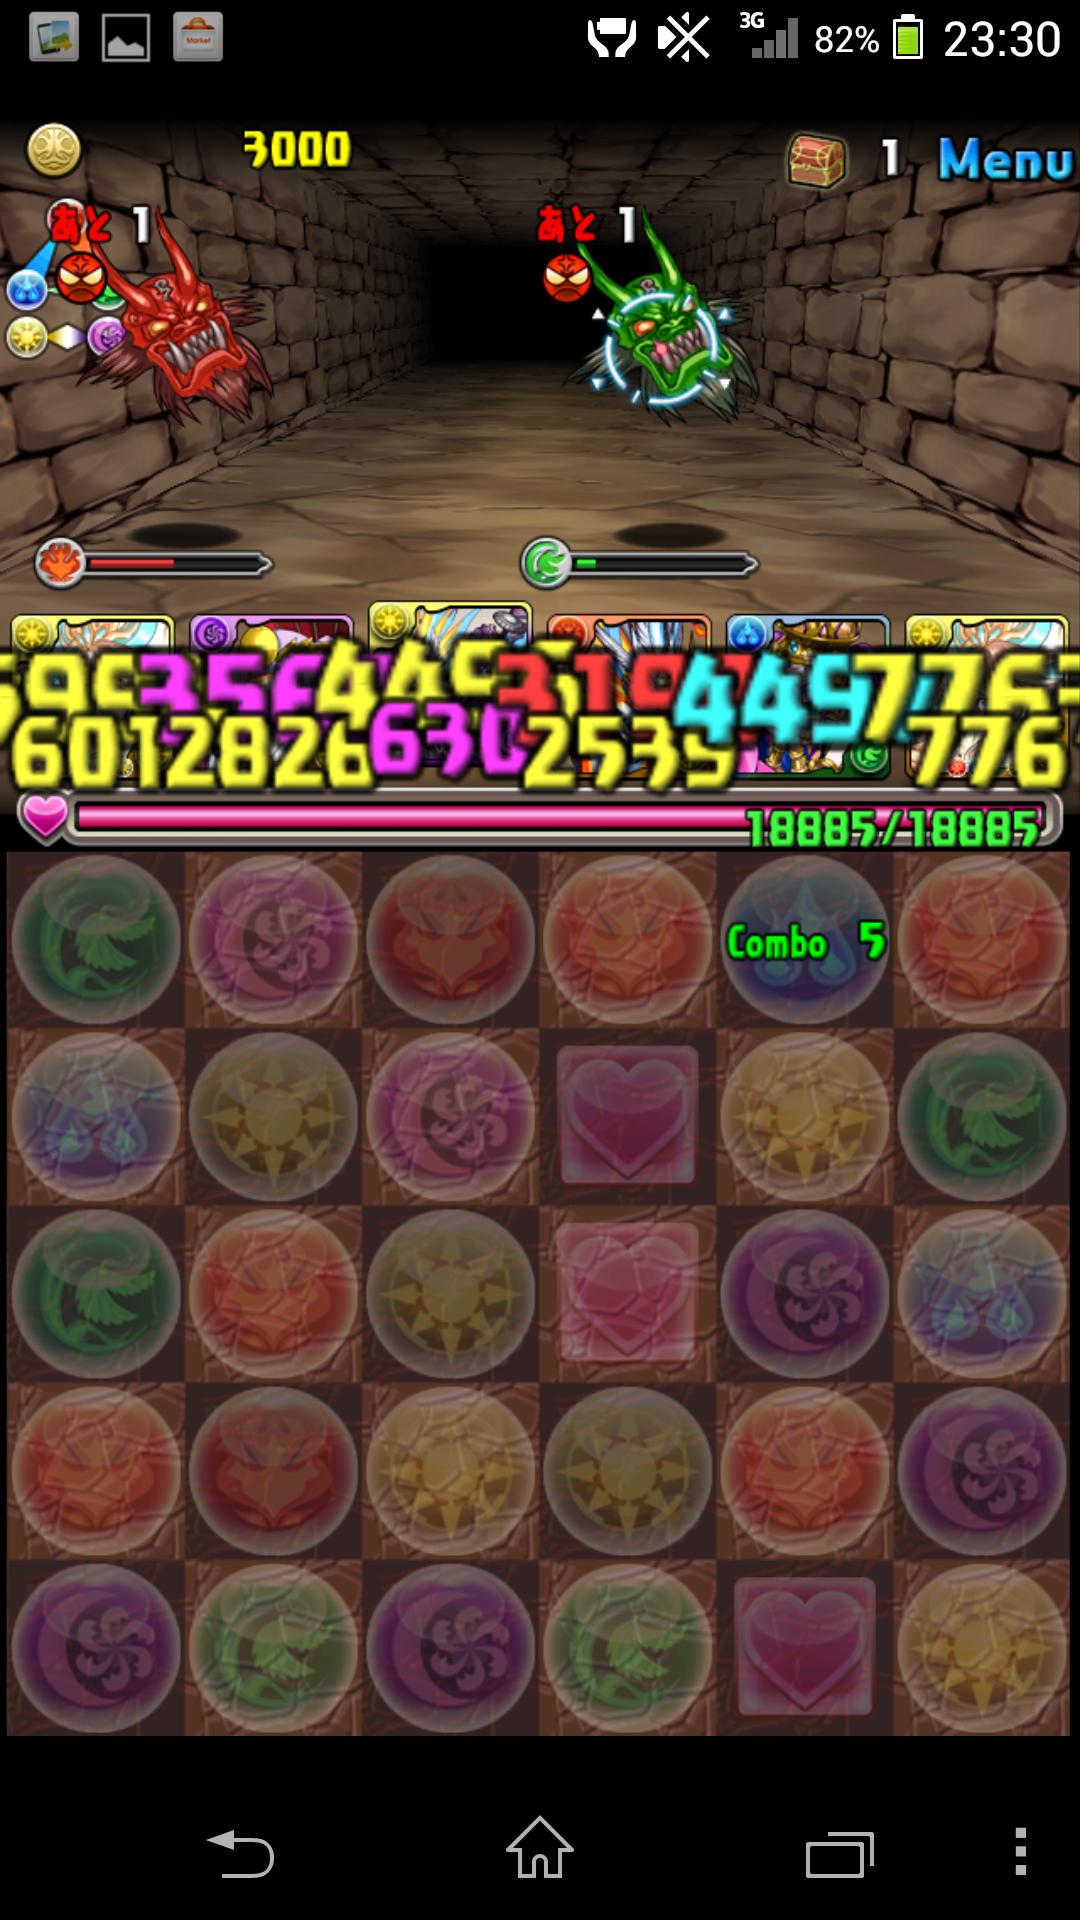 Screenshot_2014-05-07-23-30-42.png